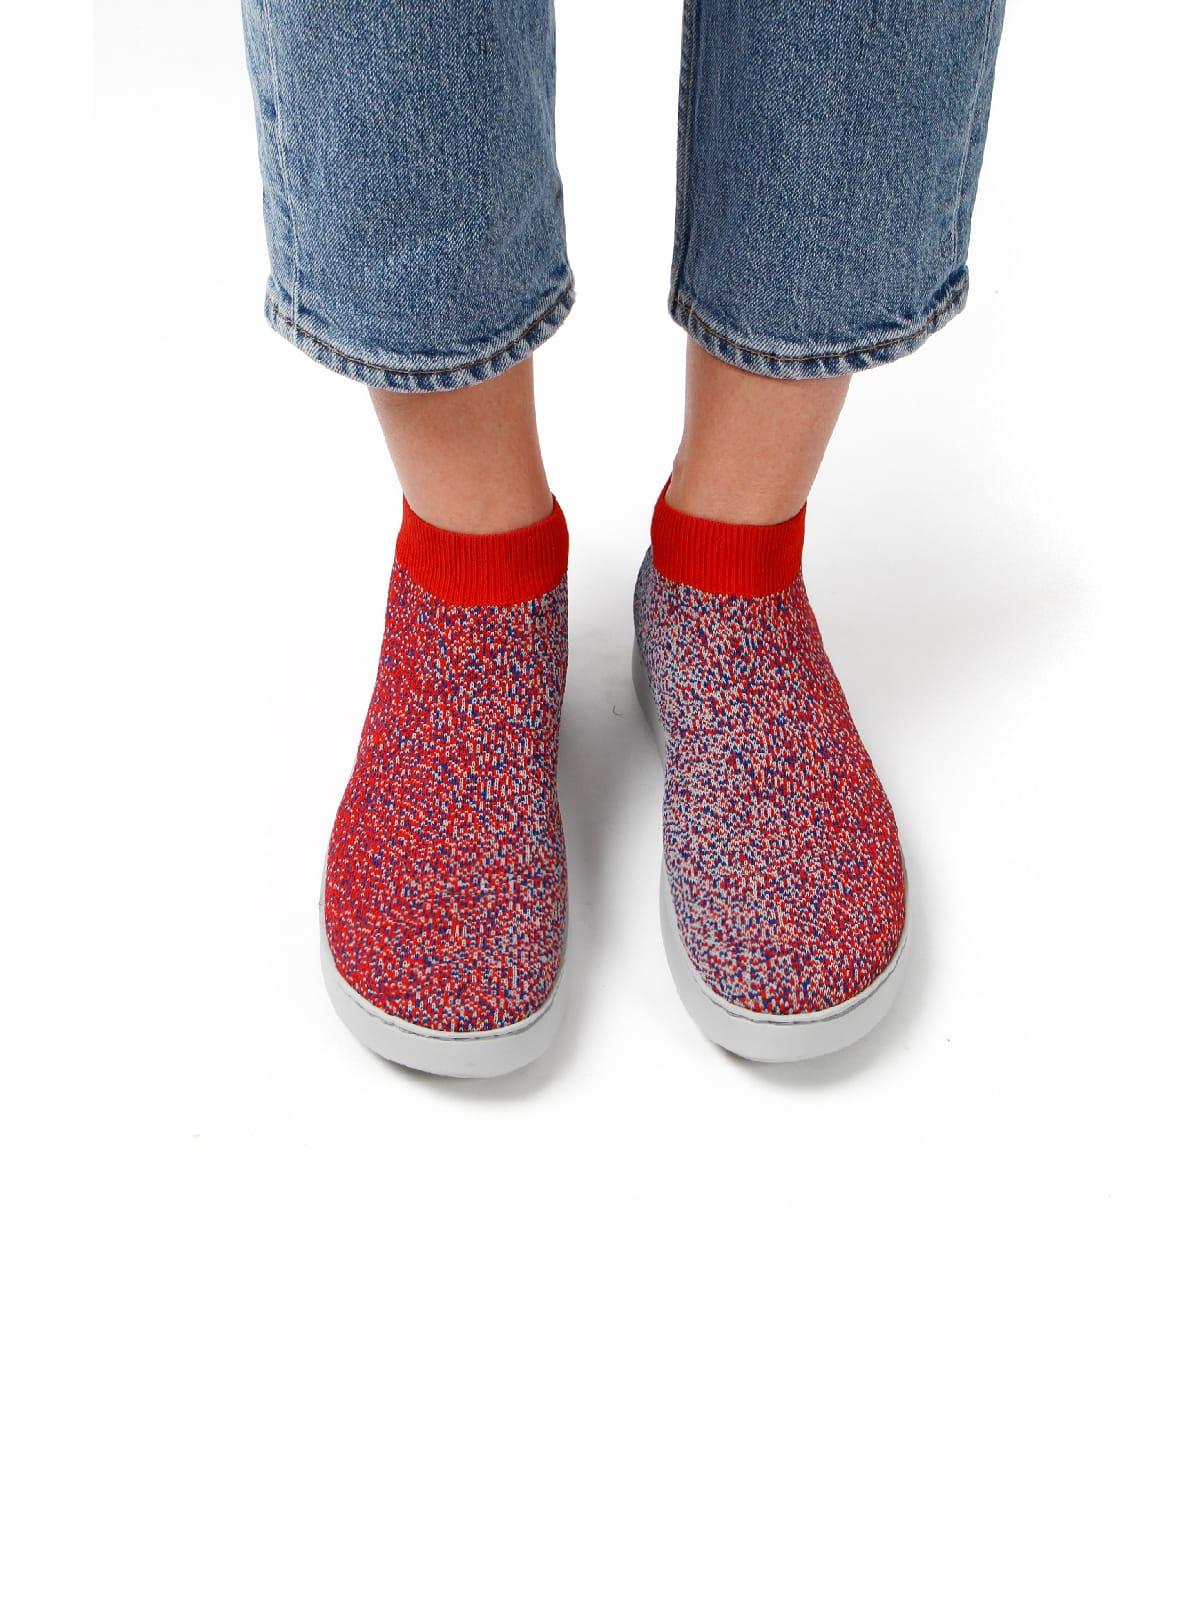 3D knitted sockboot Spexx poppy vorne K